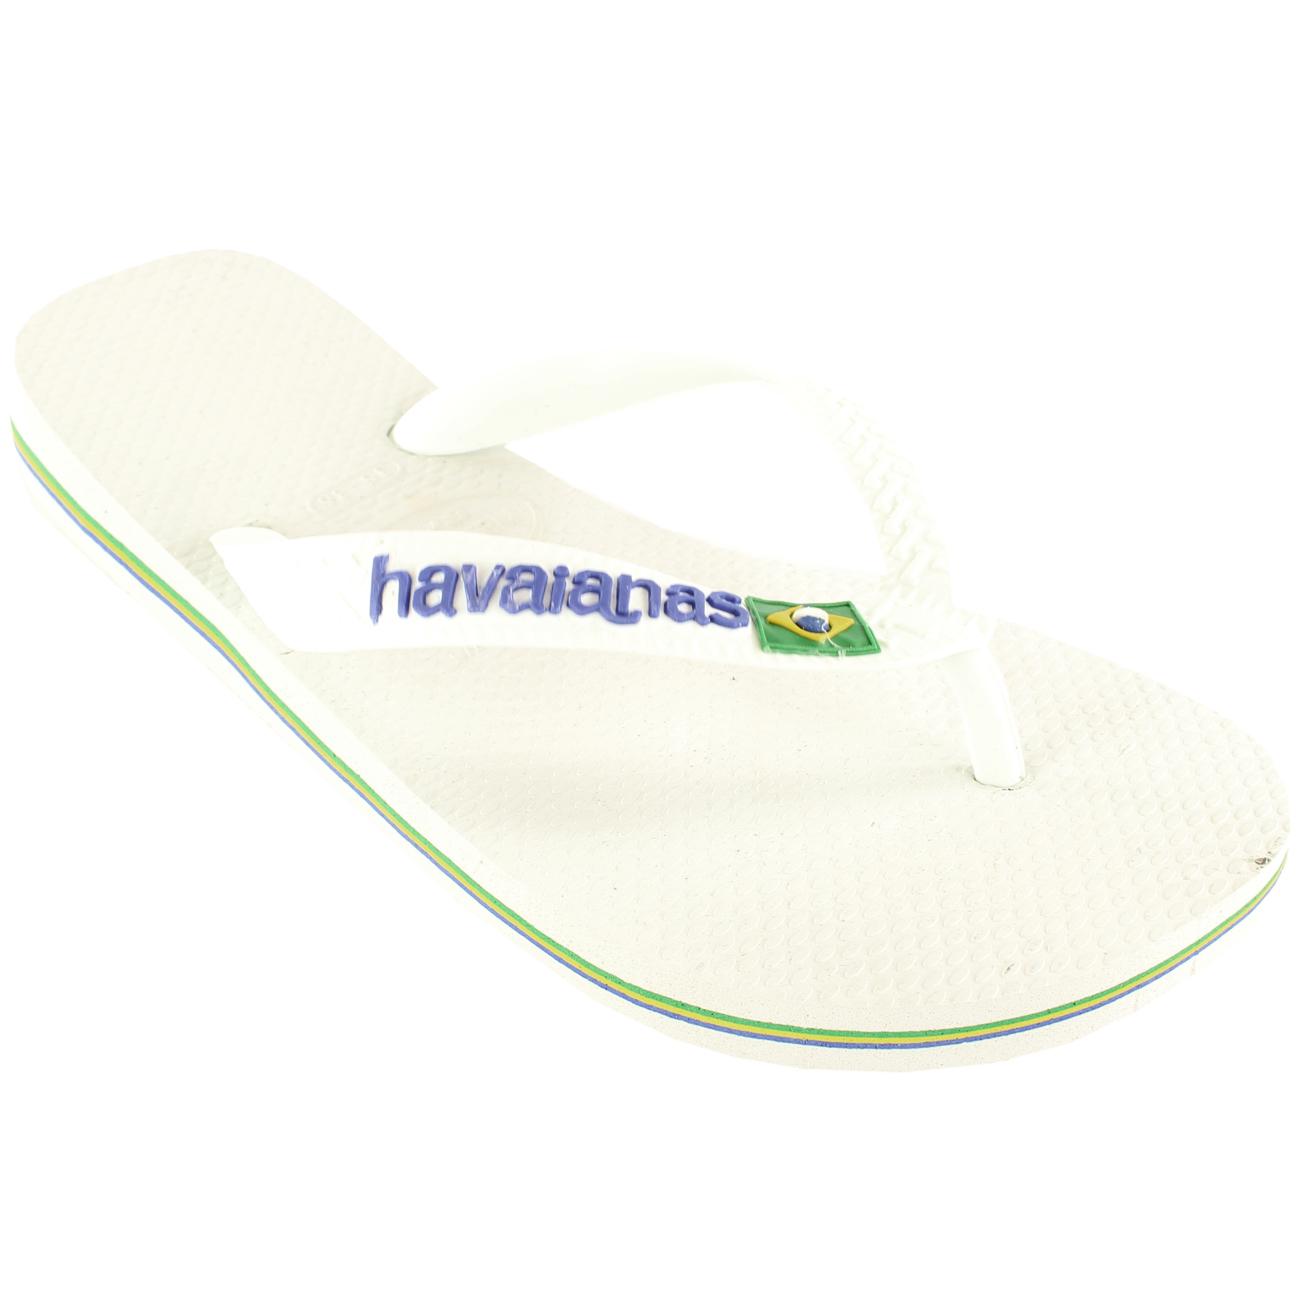 9f525331b686 Details about Ladies Havaianas Brasil Logo Slip On Flip Flops Summer Beach  Sandals All Sizes